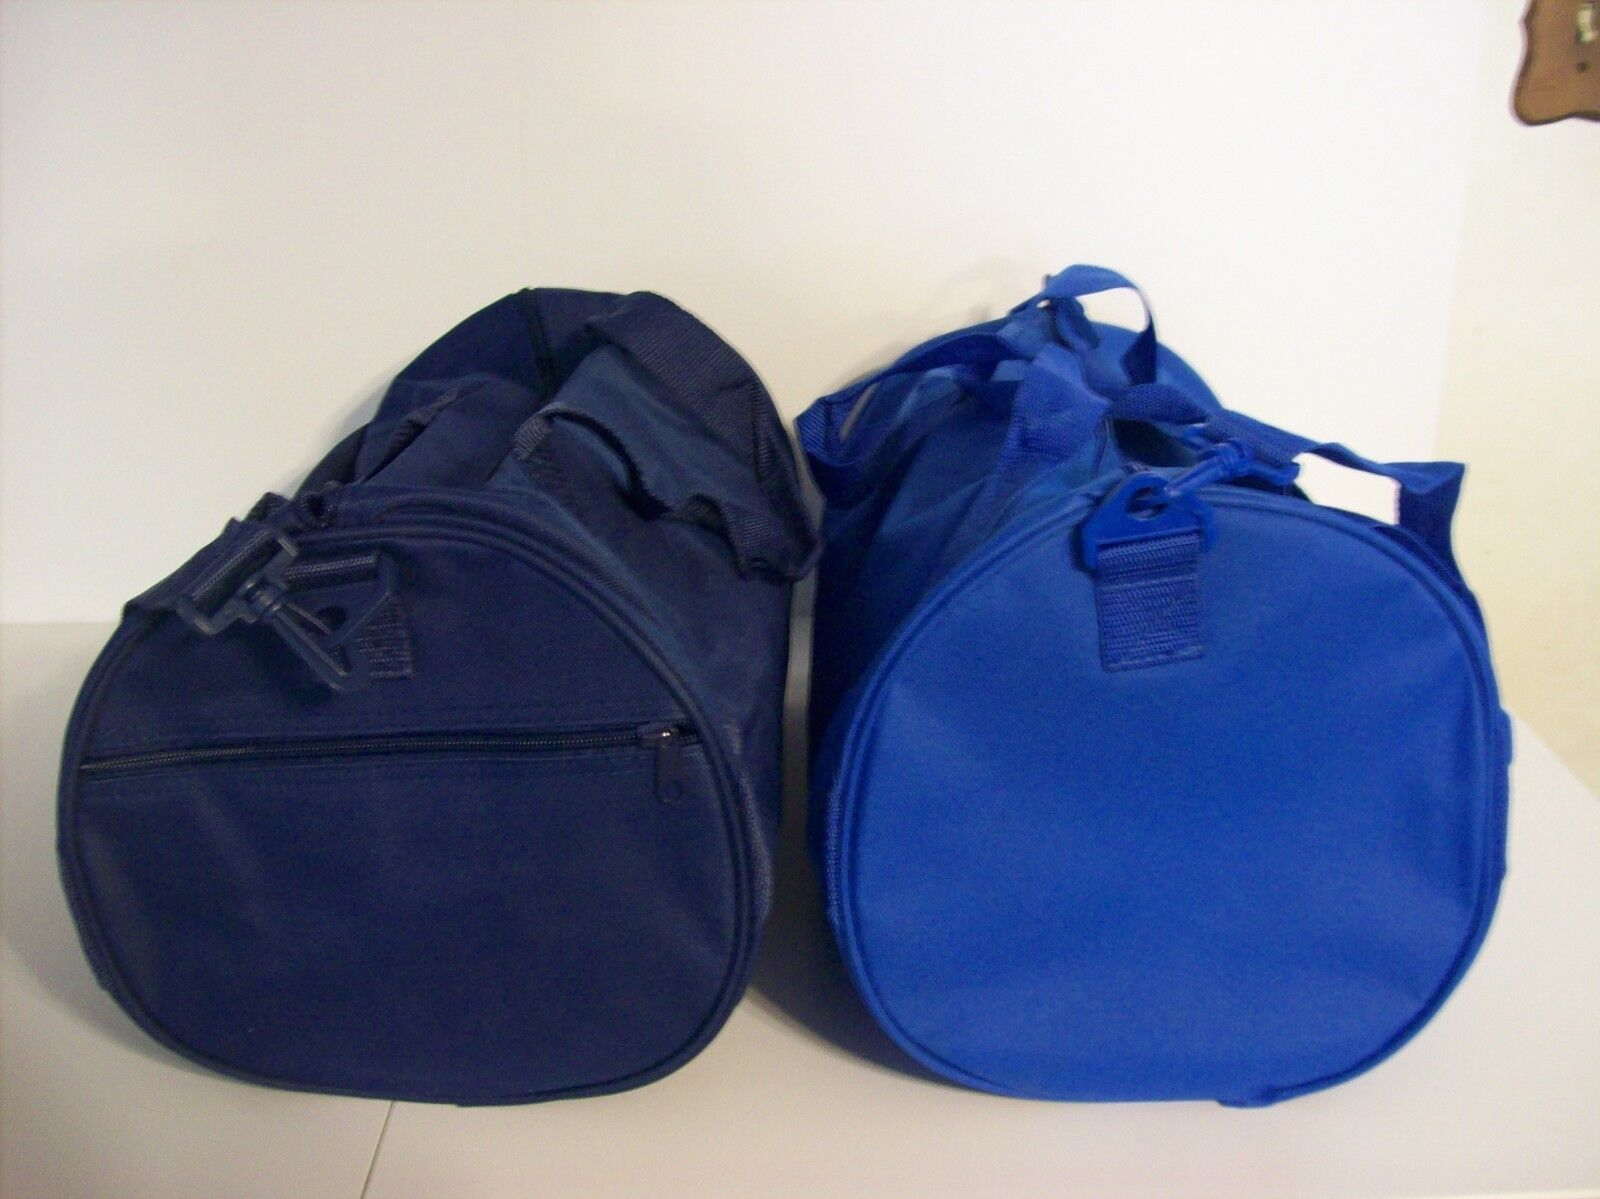 "Liberty Bags Barrel Duffel Bag 8805 18""w X 10""t X 10""D Polye"